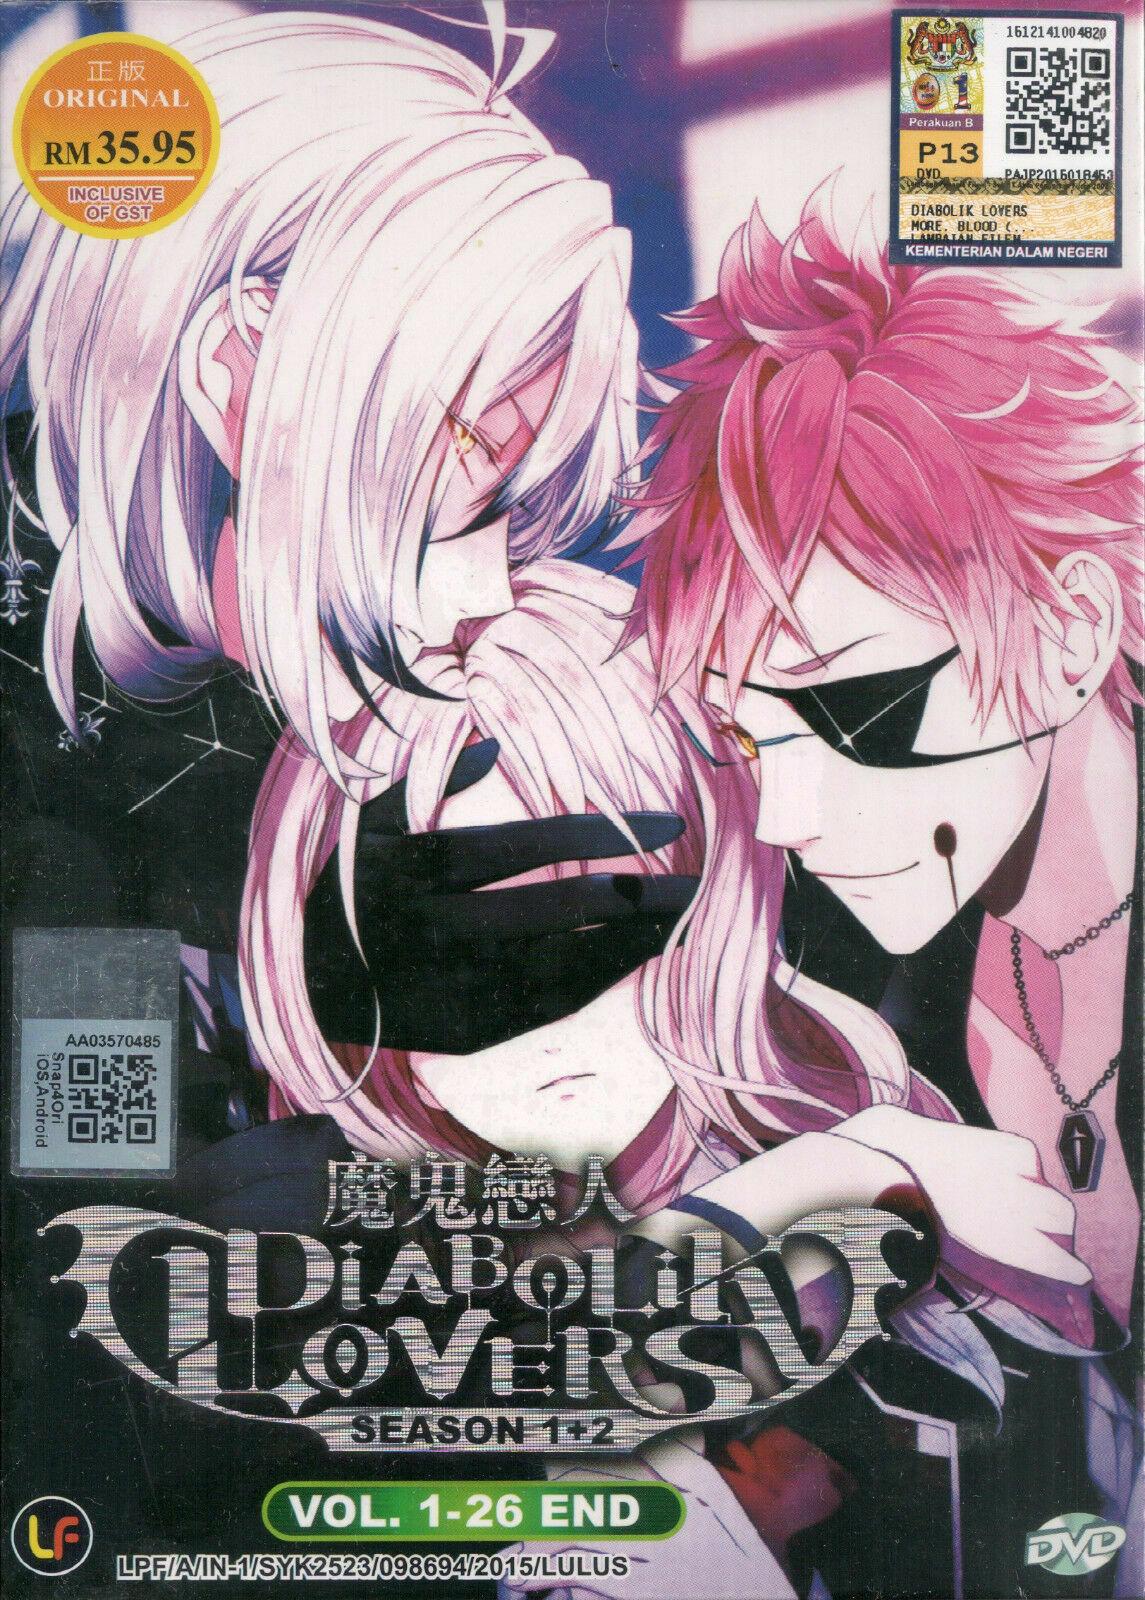 DVD Anime Diabolik Lovers Complete Season 1+2 (Vol.1-26 End) English Subtitle